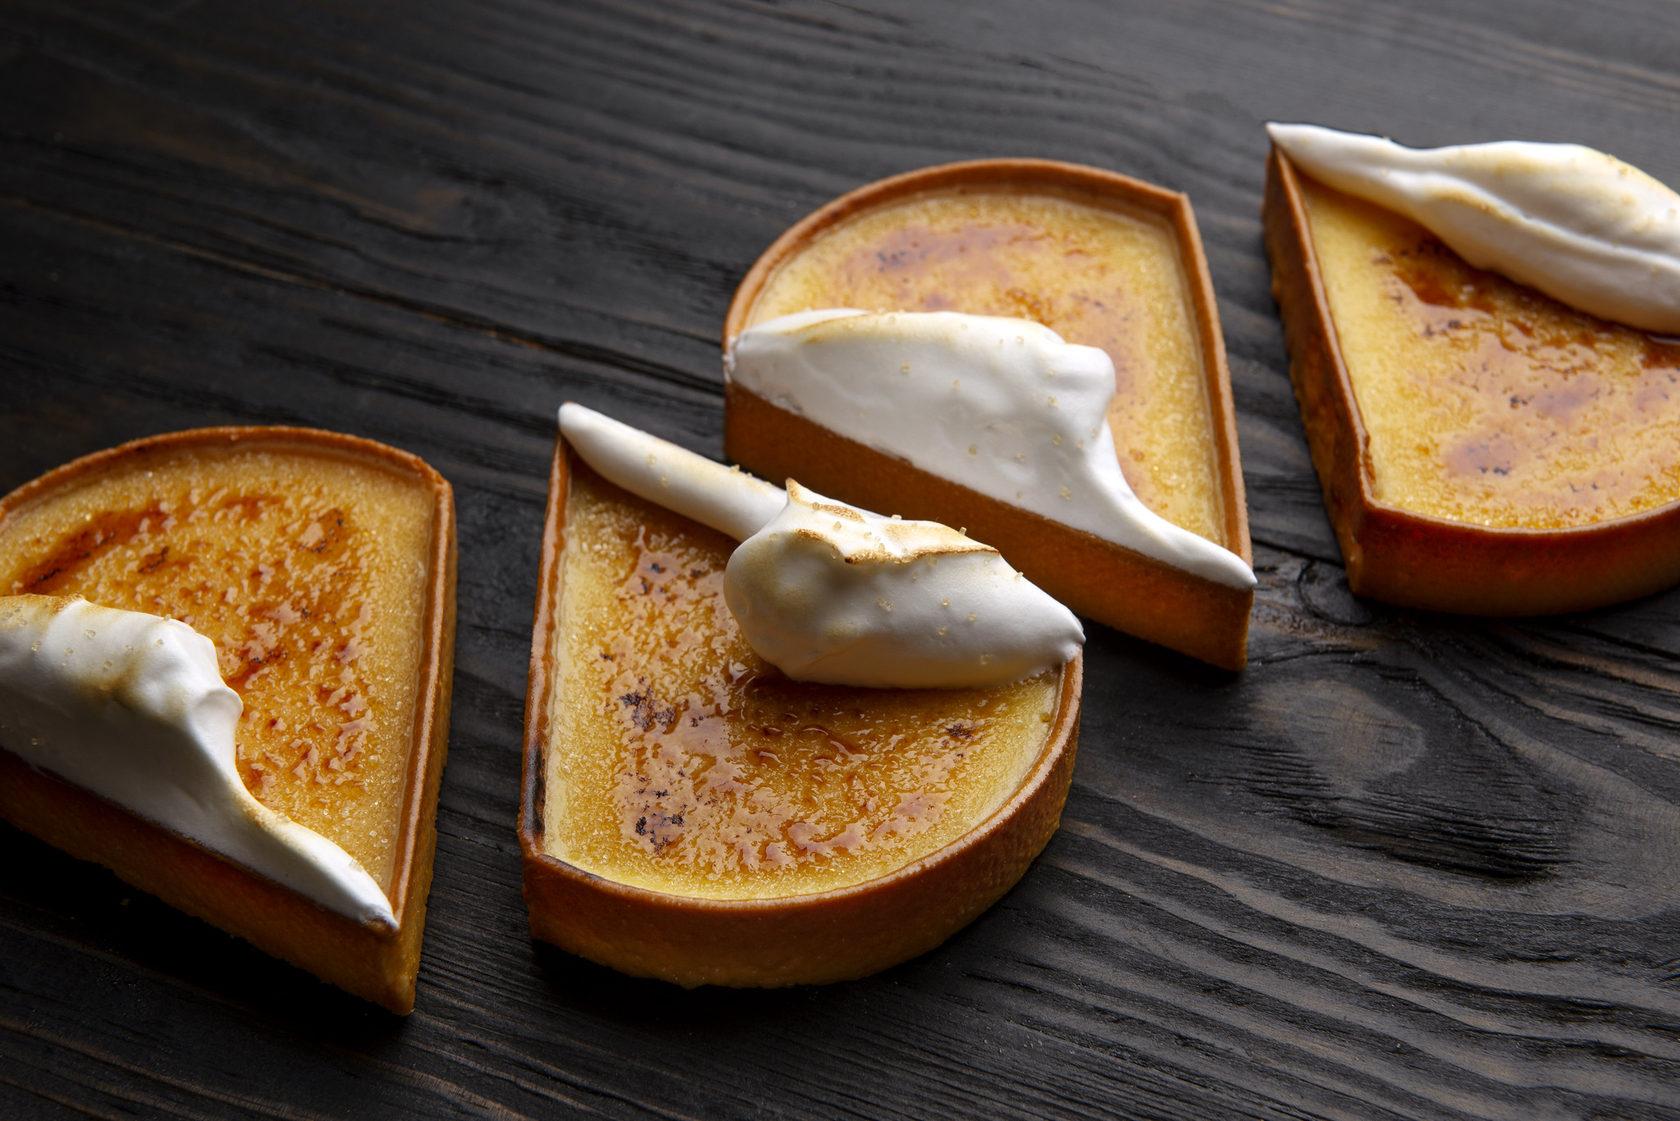 dessert triangle